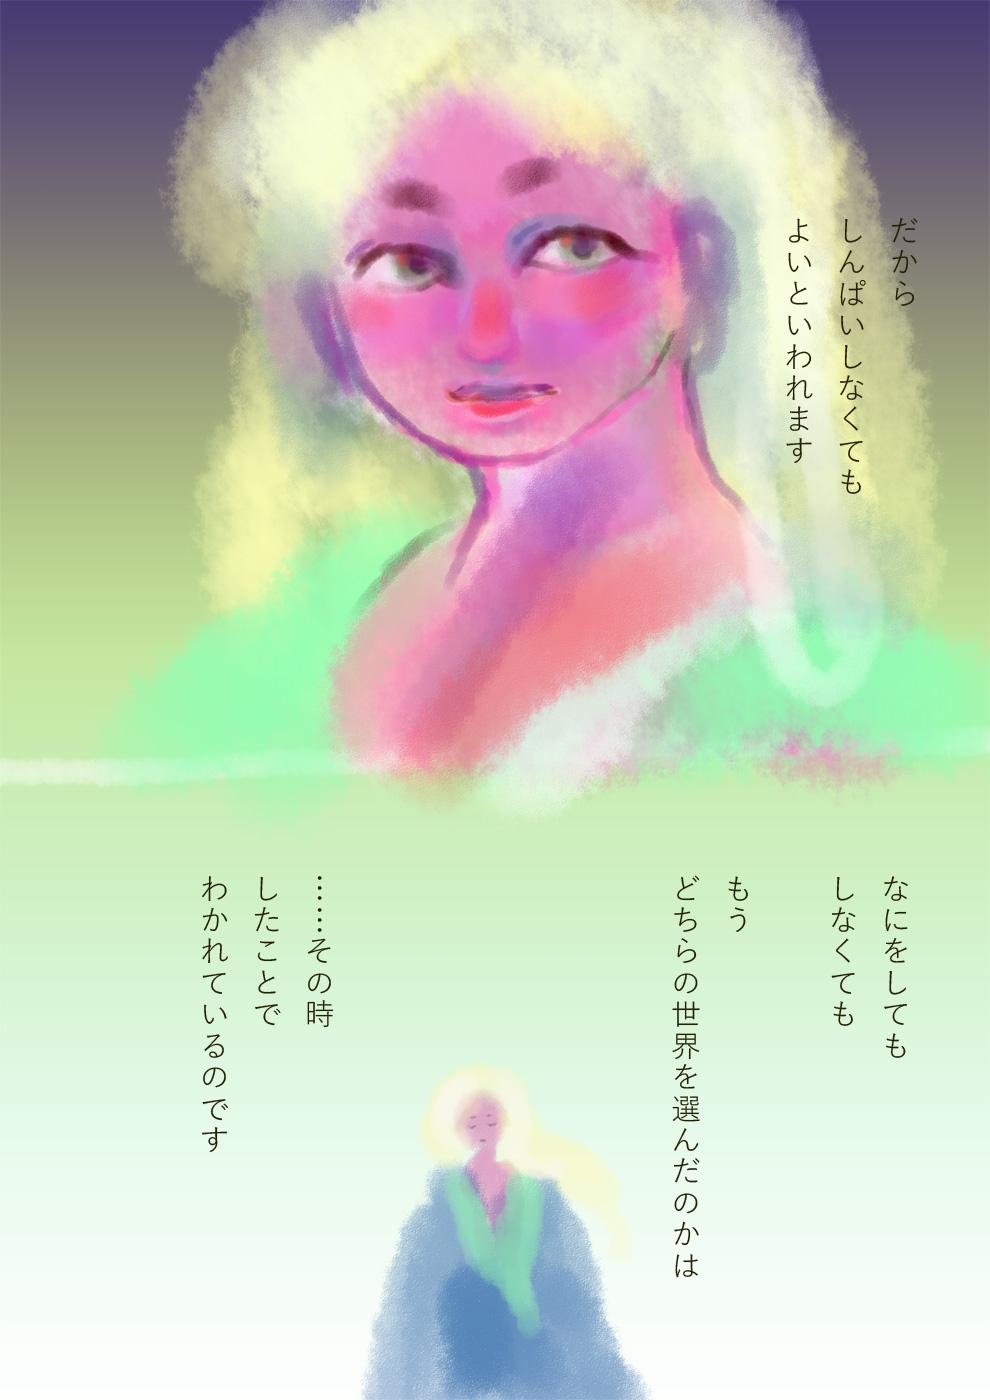 http://ahito.com/comic/ehon/kamiuta/img/2018/20180319/04.jpg